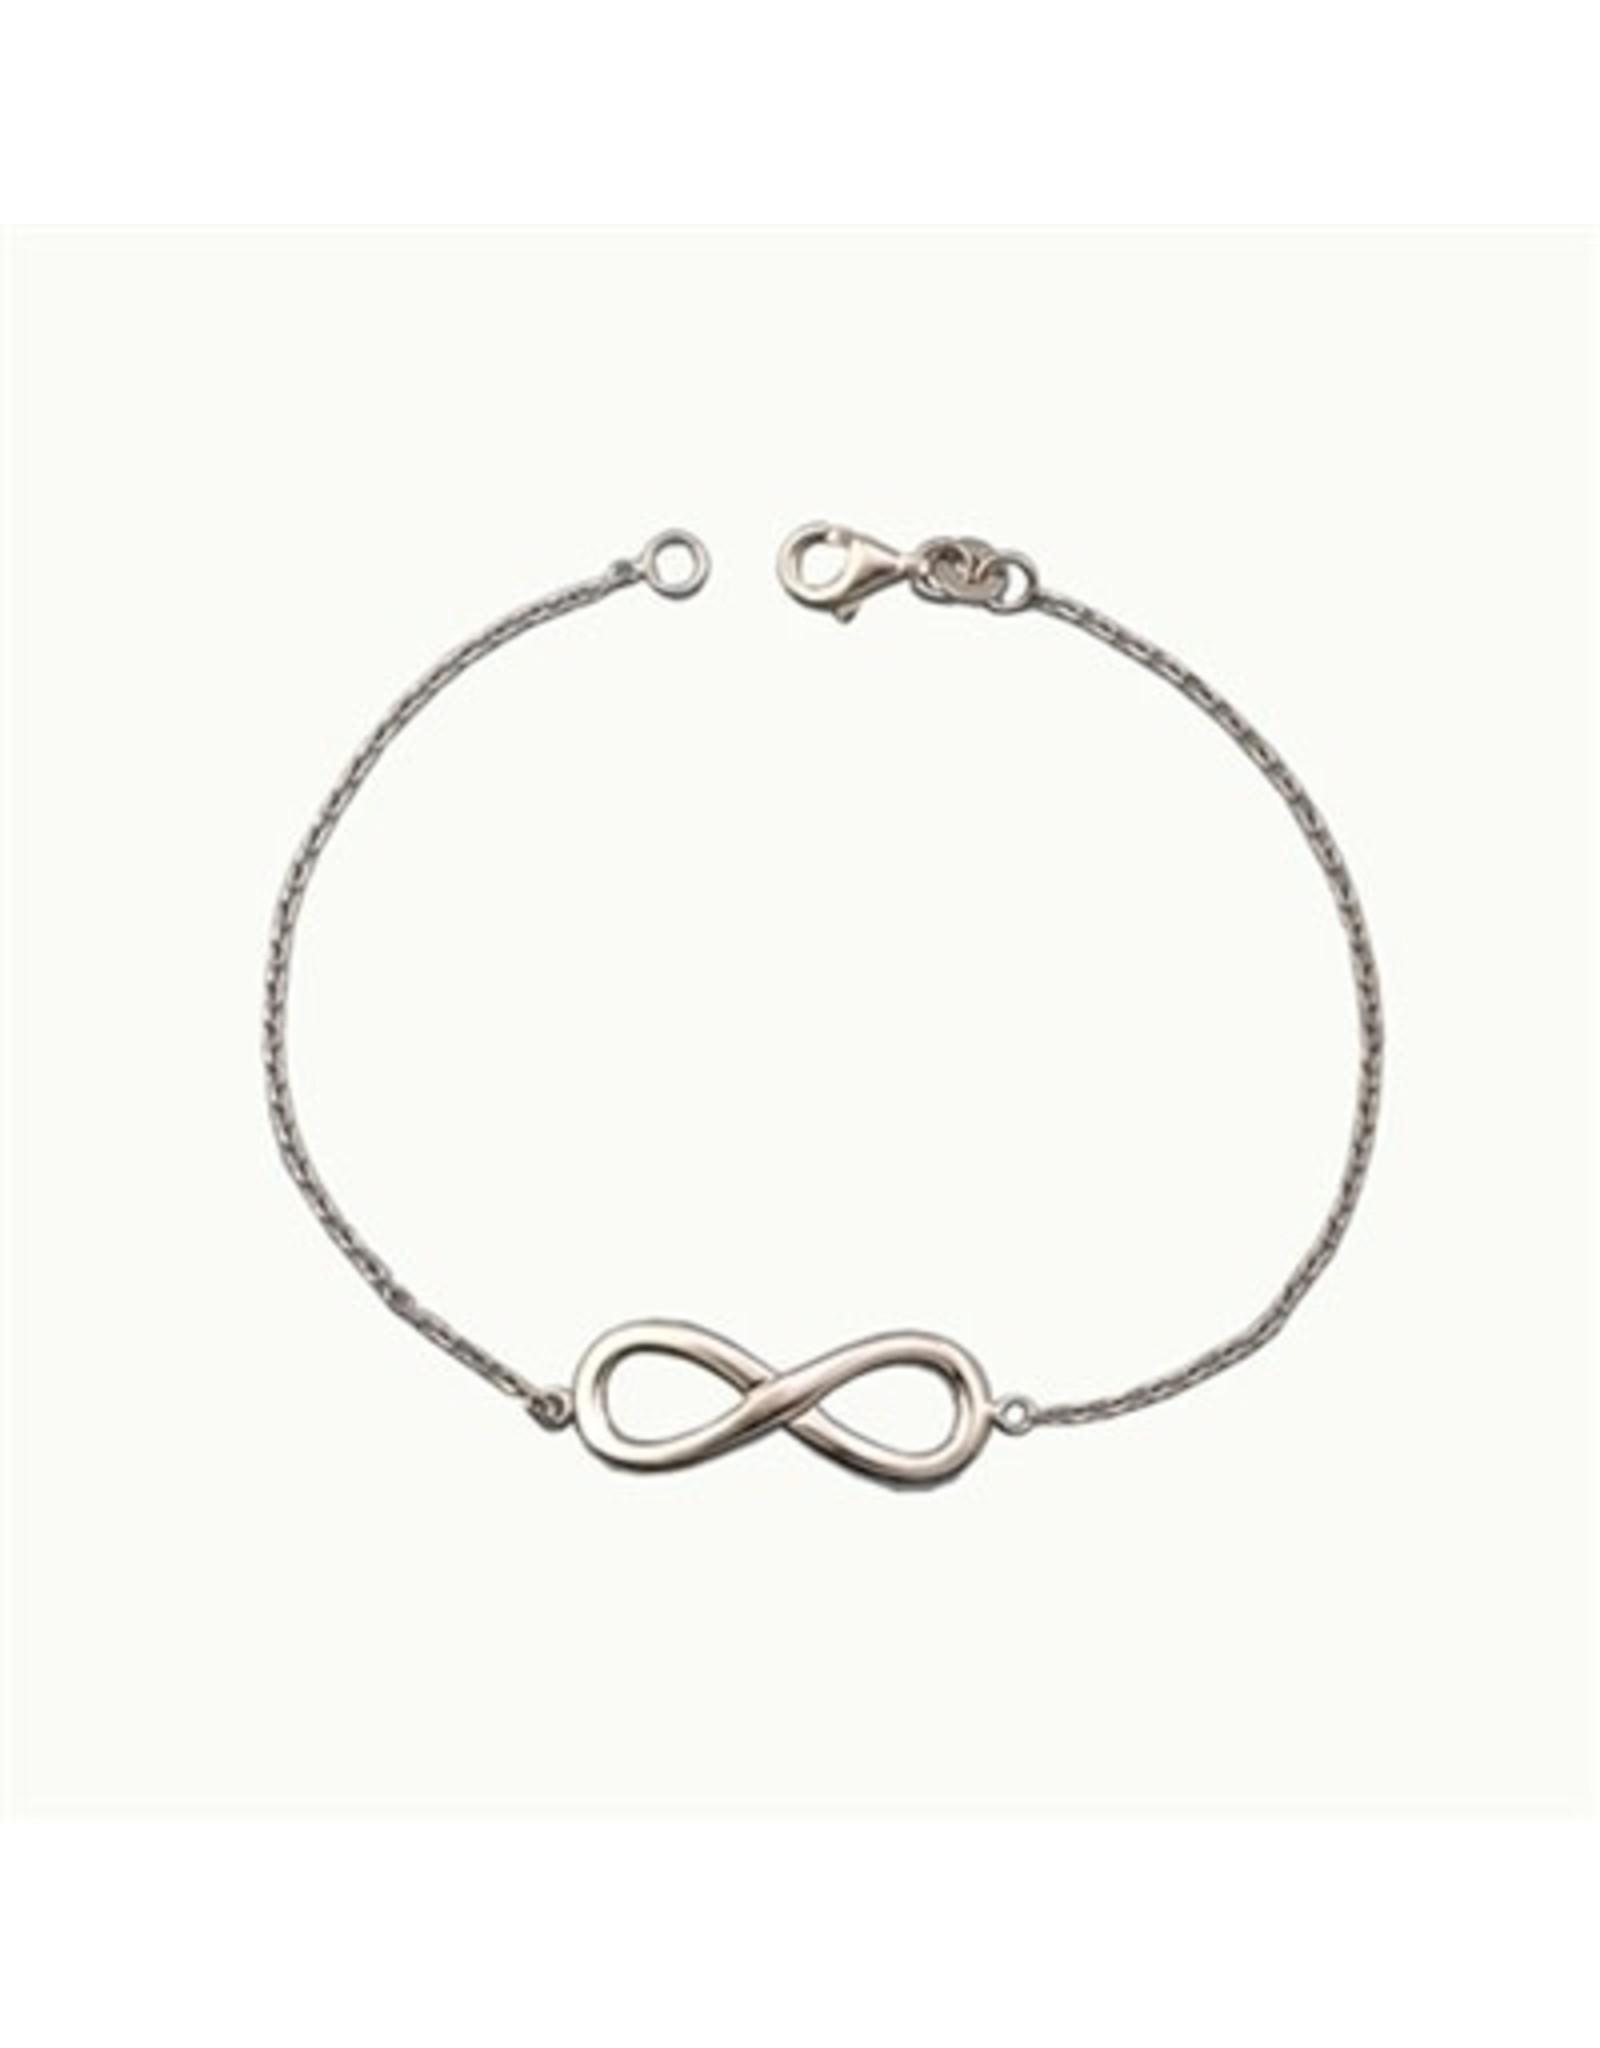 Chain and Hoop/Siloro INFINITY BRACELET